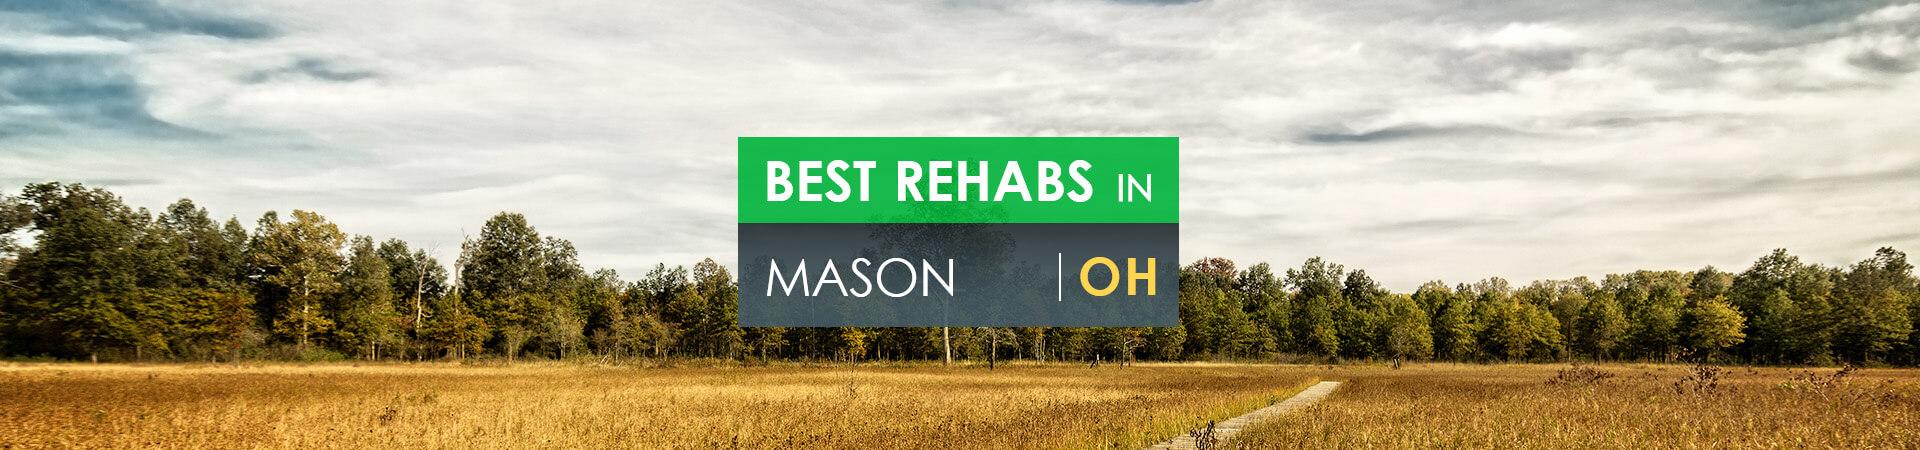 Best rehabs in Mason, OH